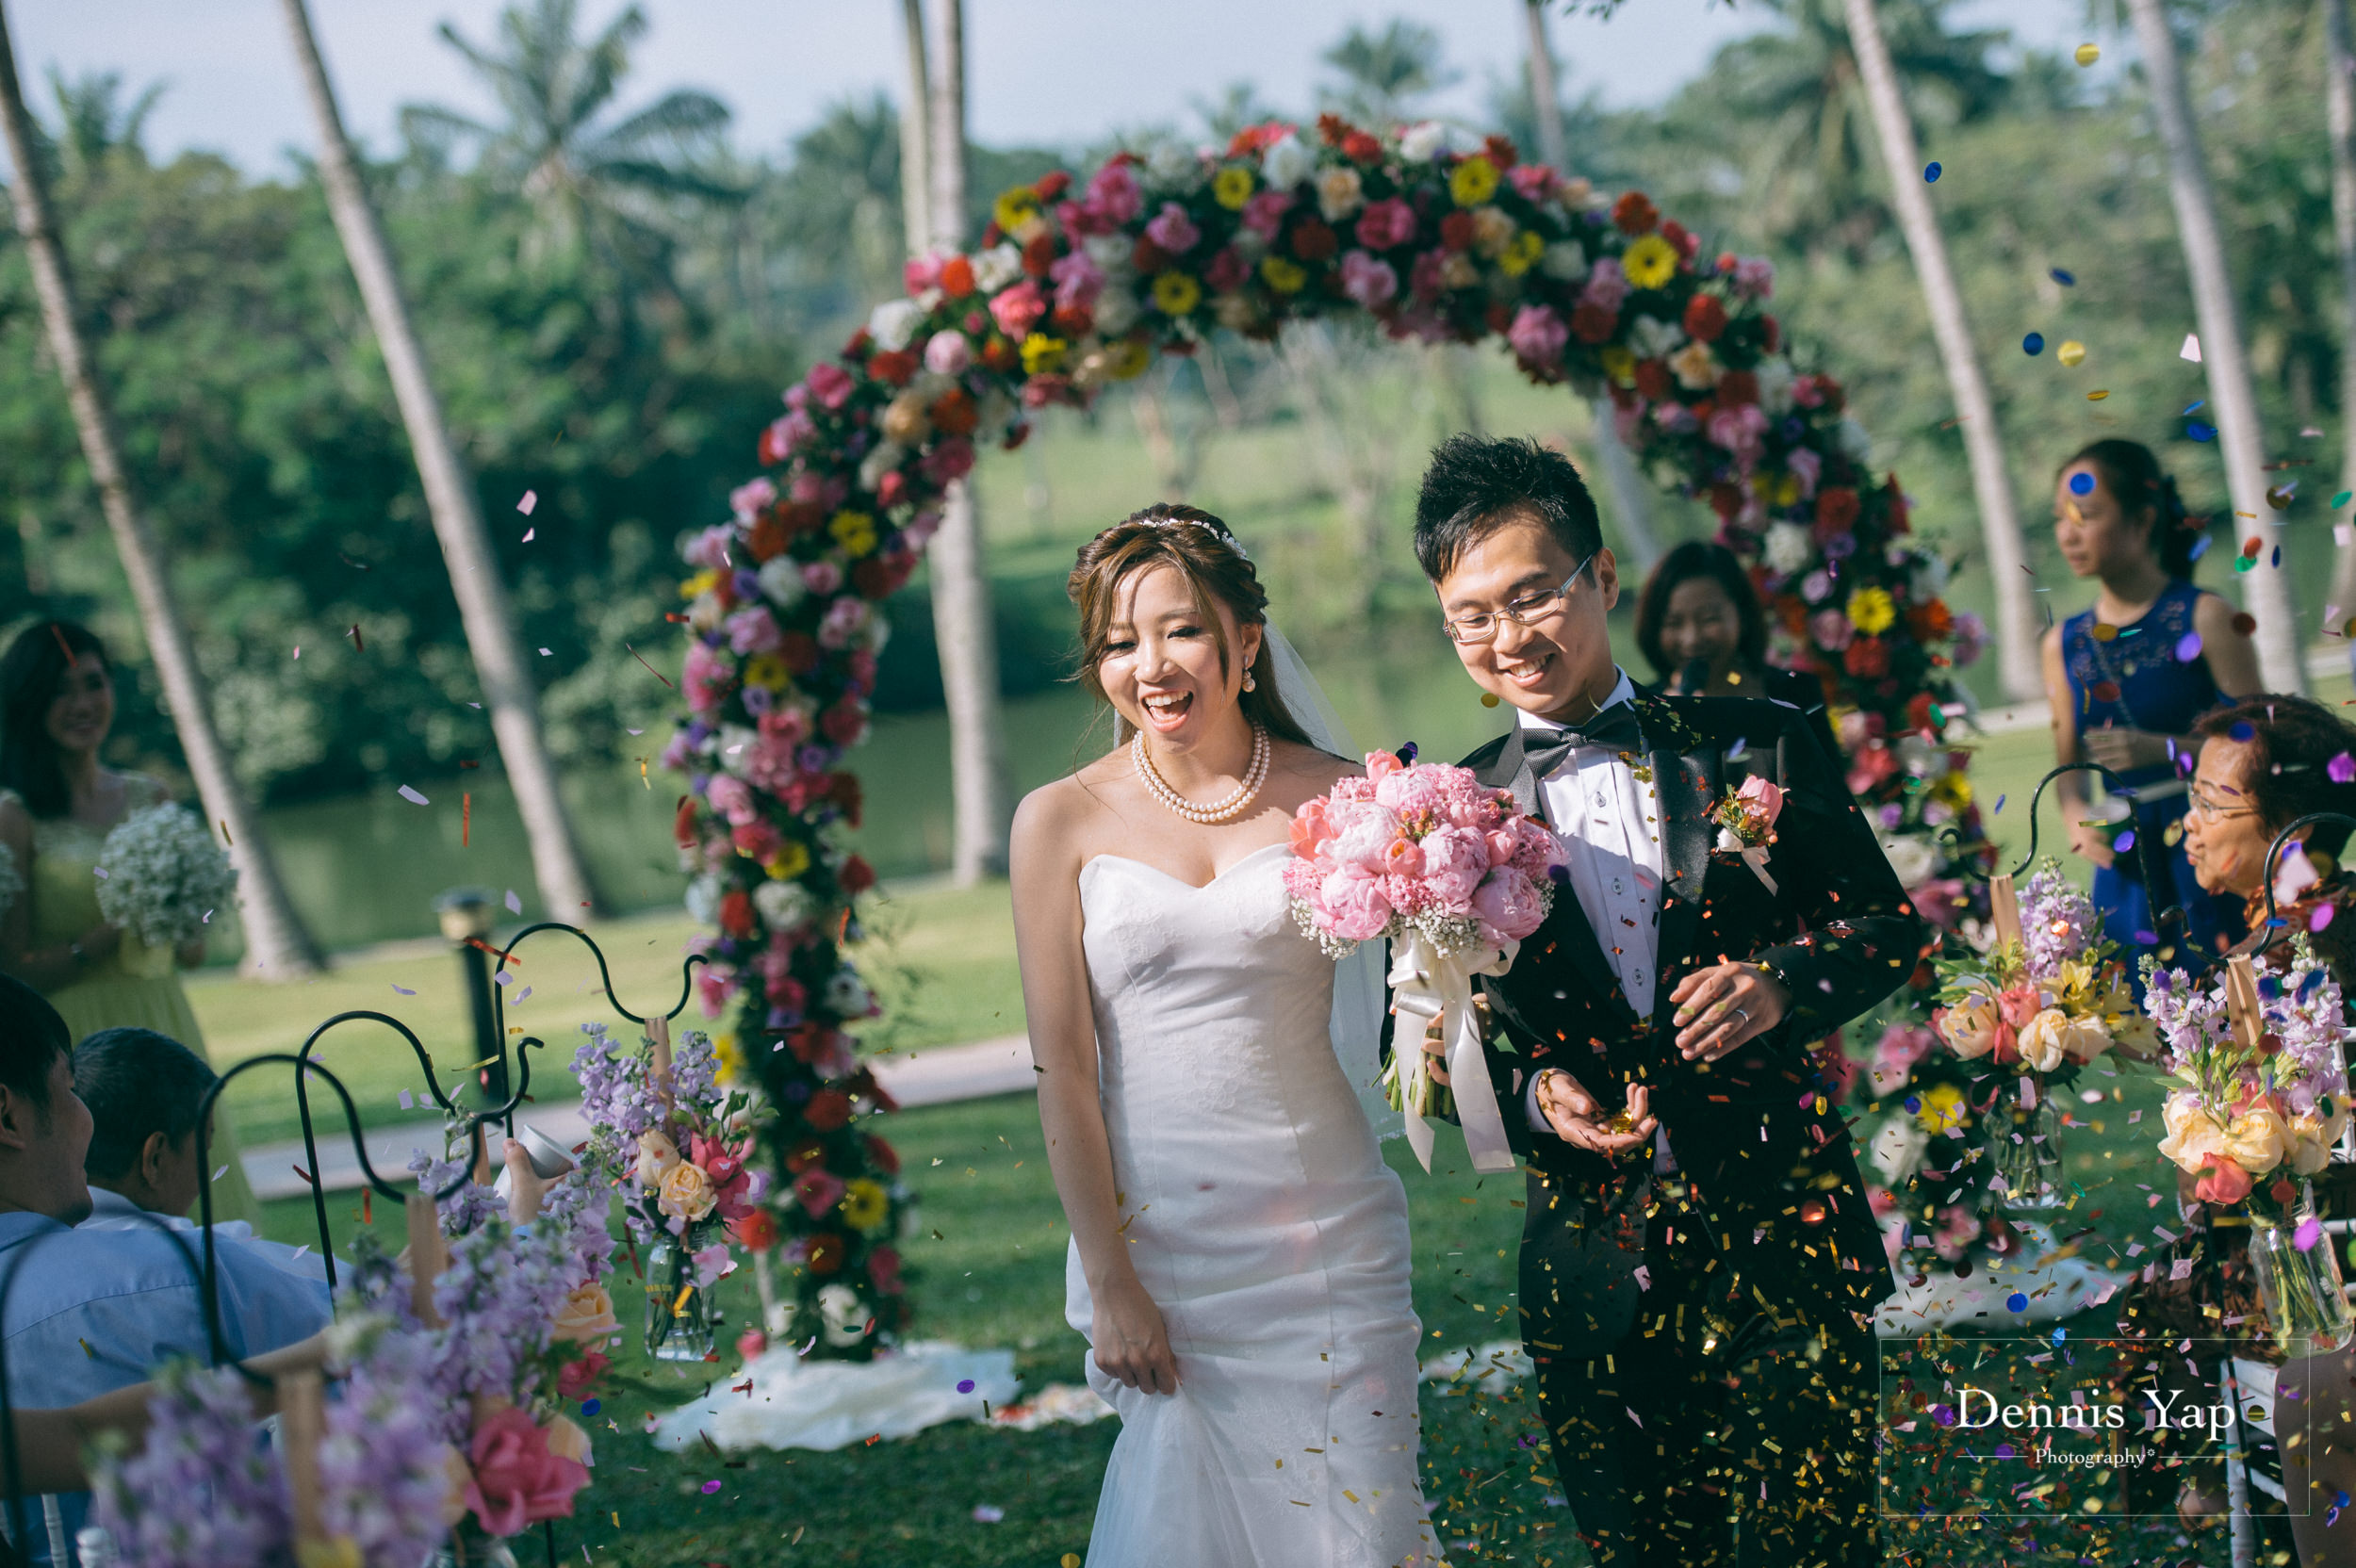 taylai cheng yee garden wedding saujana hotel subang jaya dennis yap photography sunlight-19.jpg